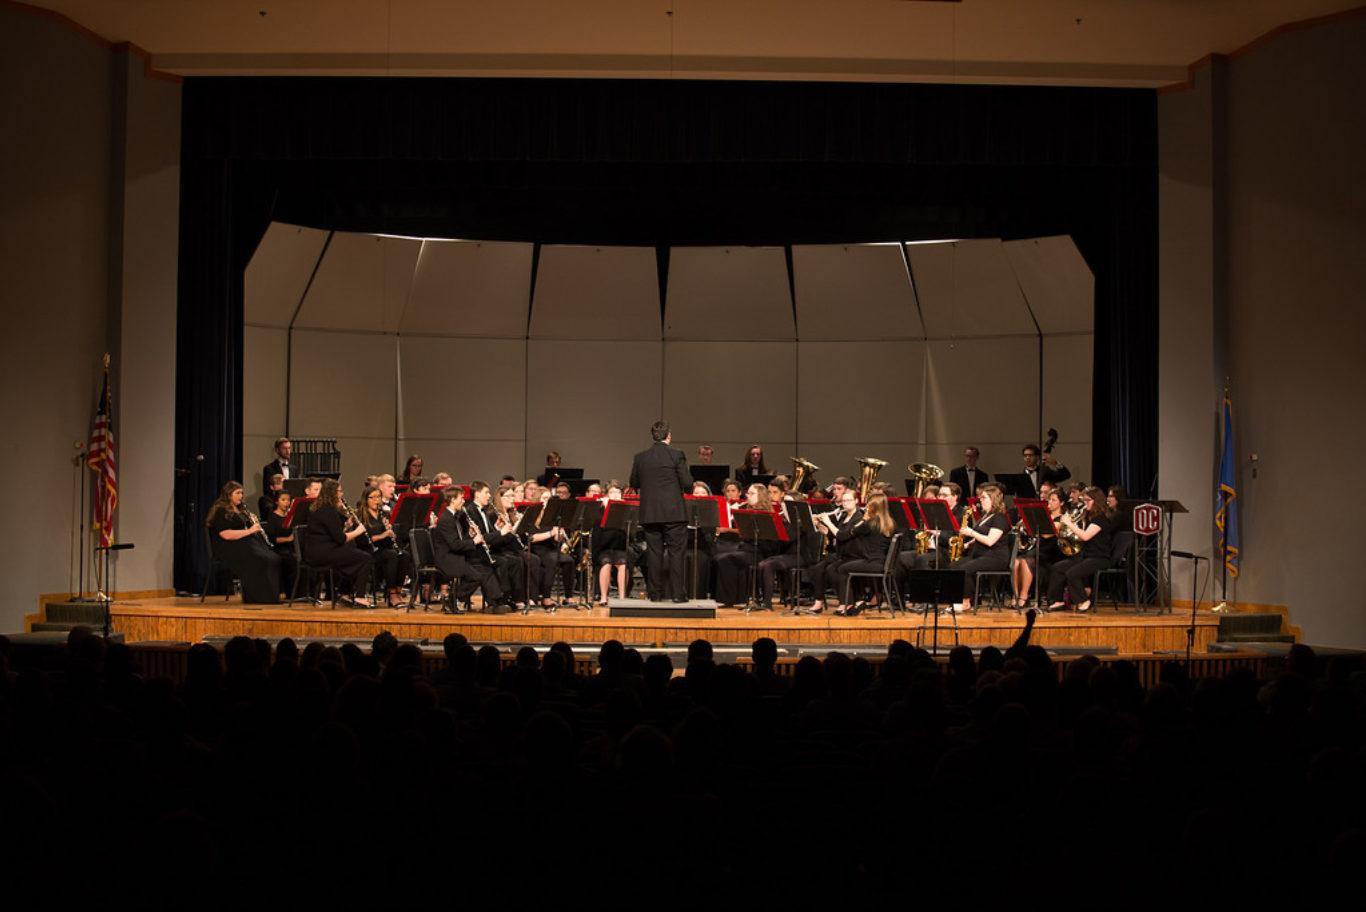 Grand Concert symphonic band